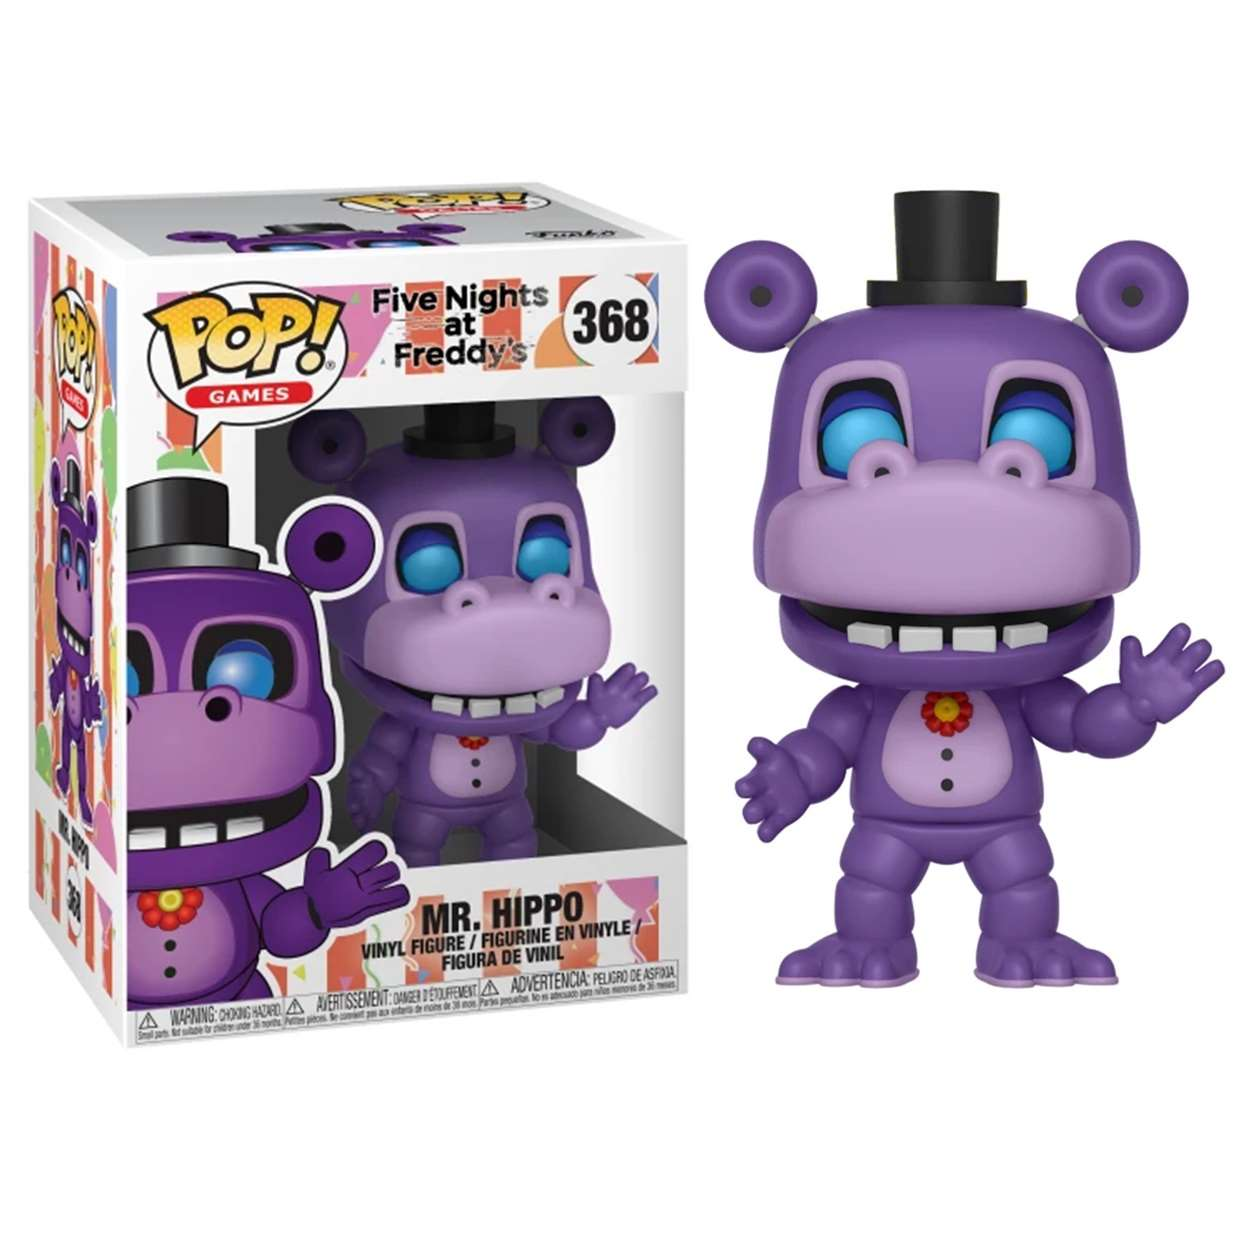 Mr. Hippo #368 Five Nights At Freddy's Funko Pop! Games